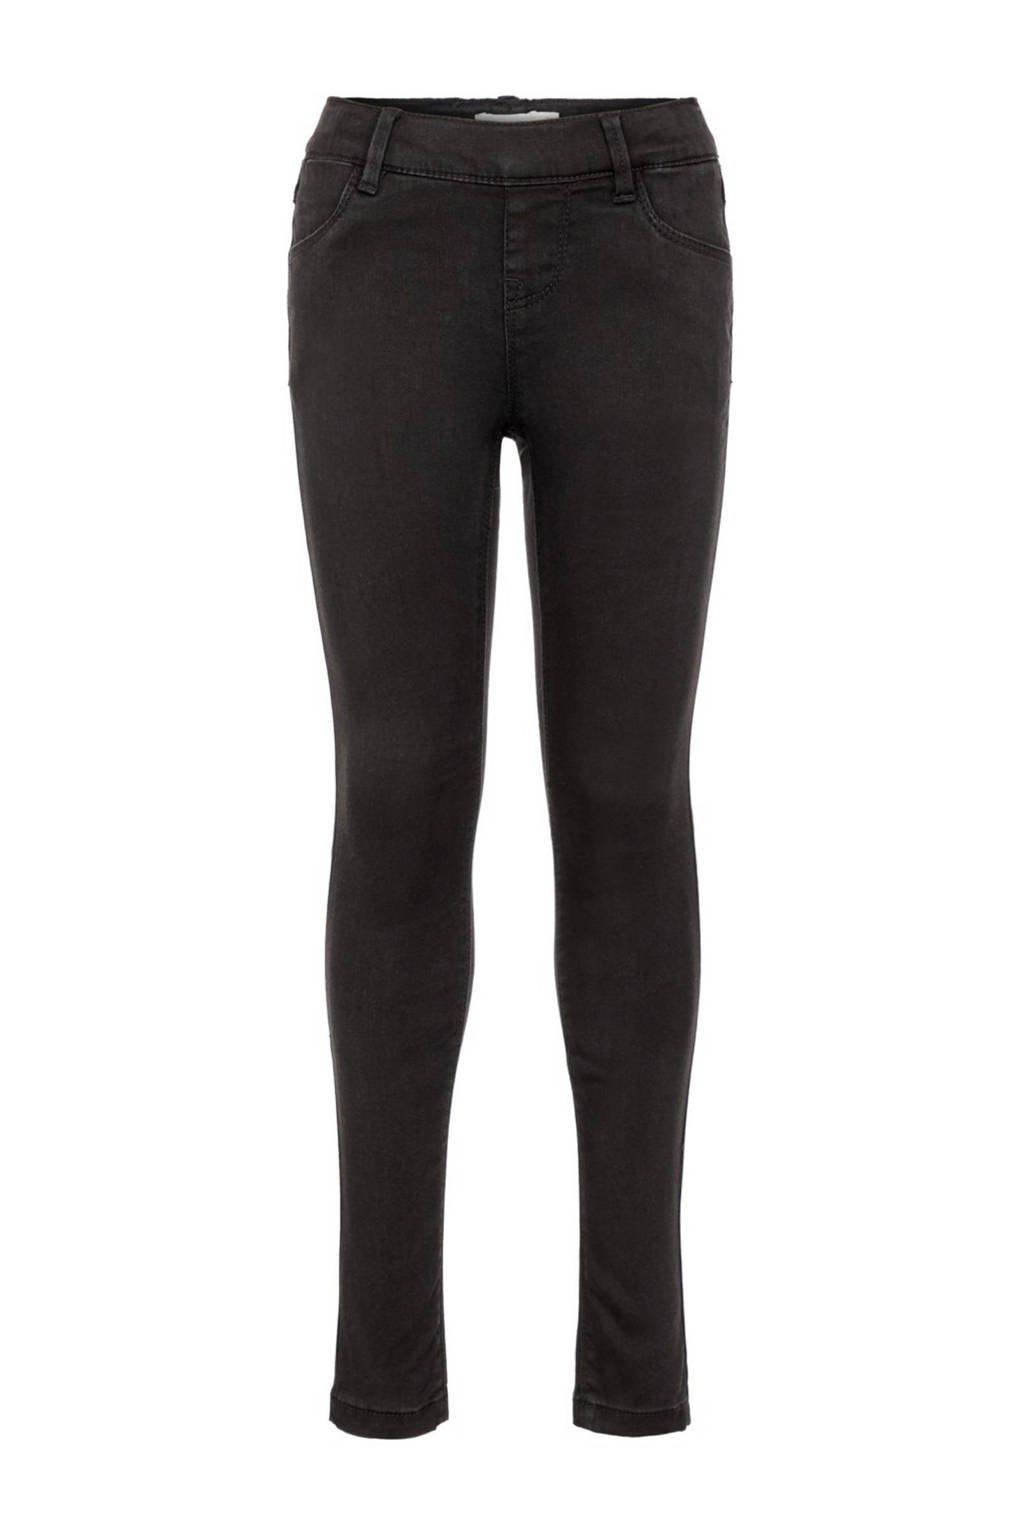 NAME IT KIDS skinny jeans Polly zwart, Zwart